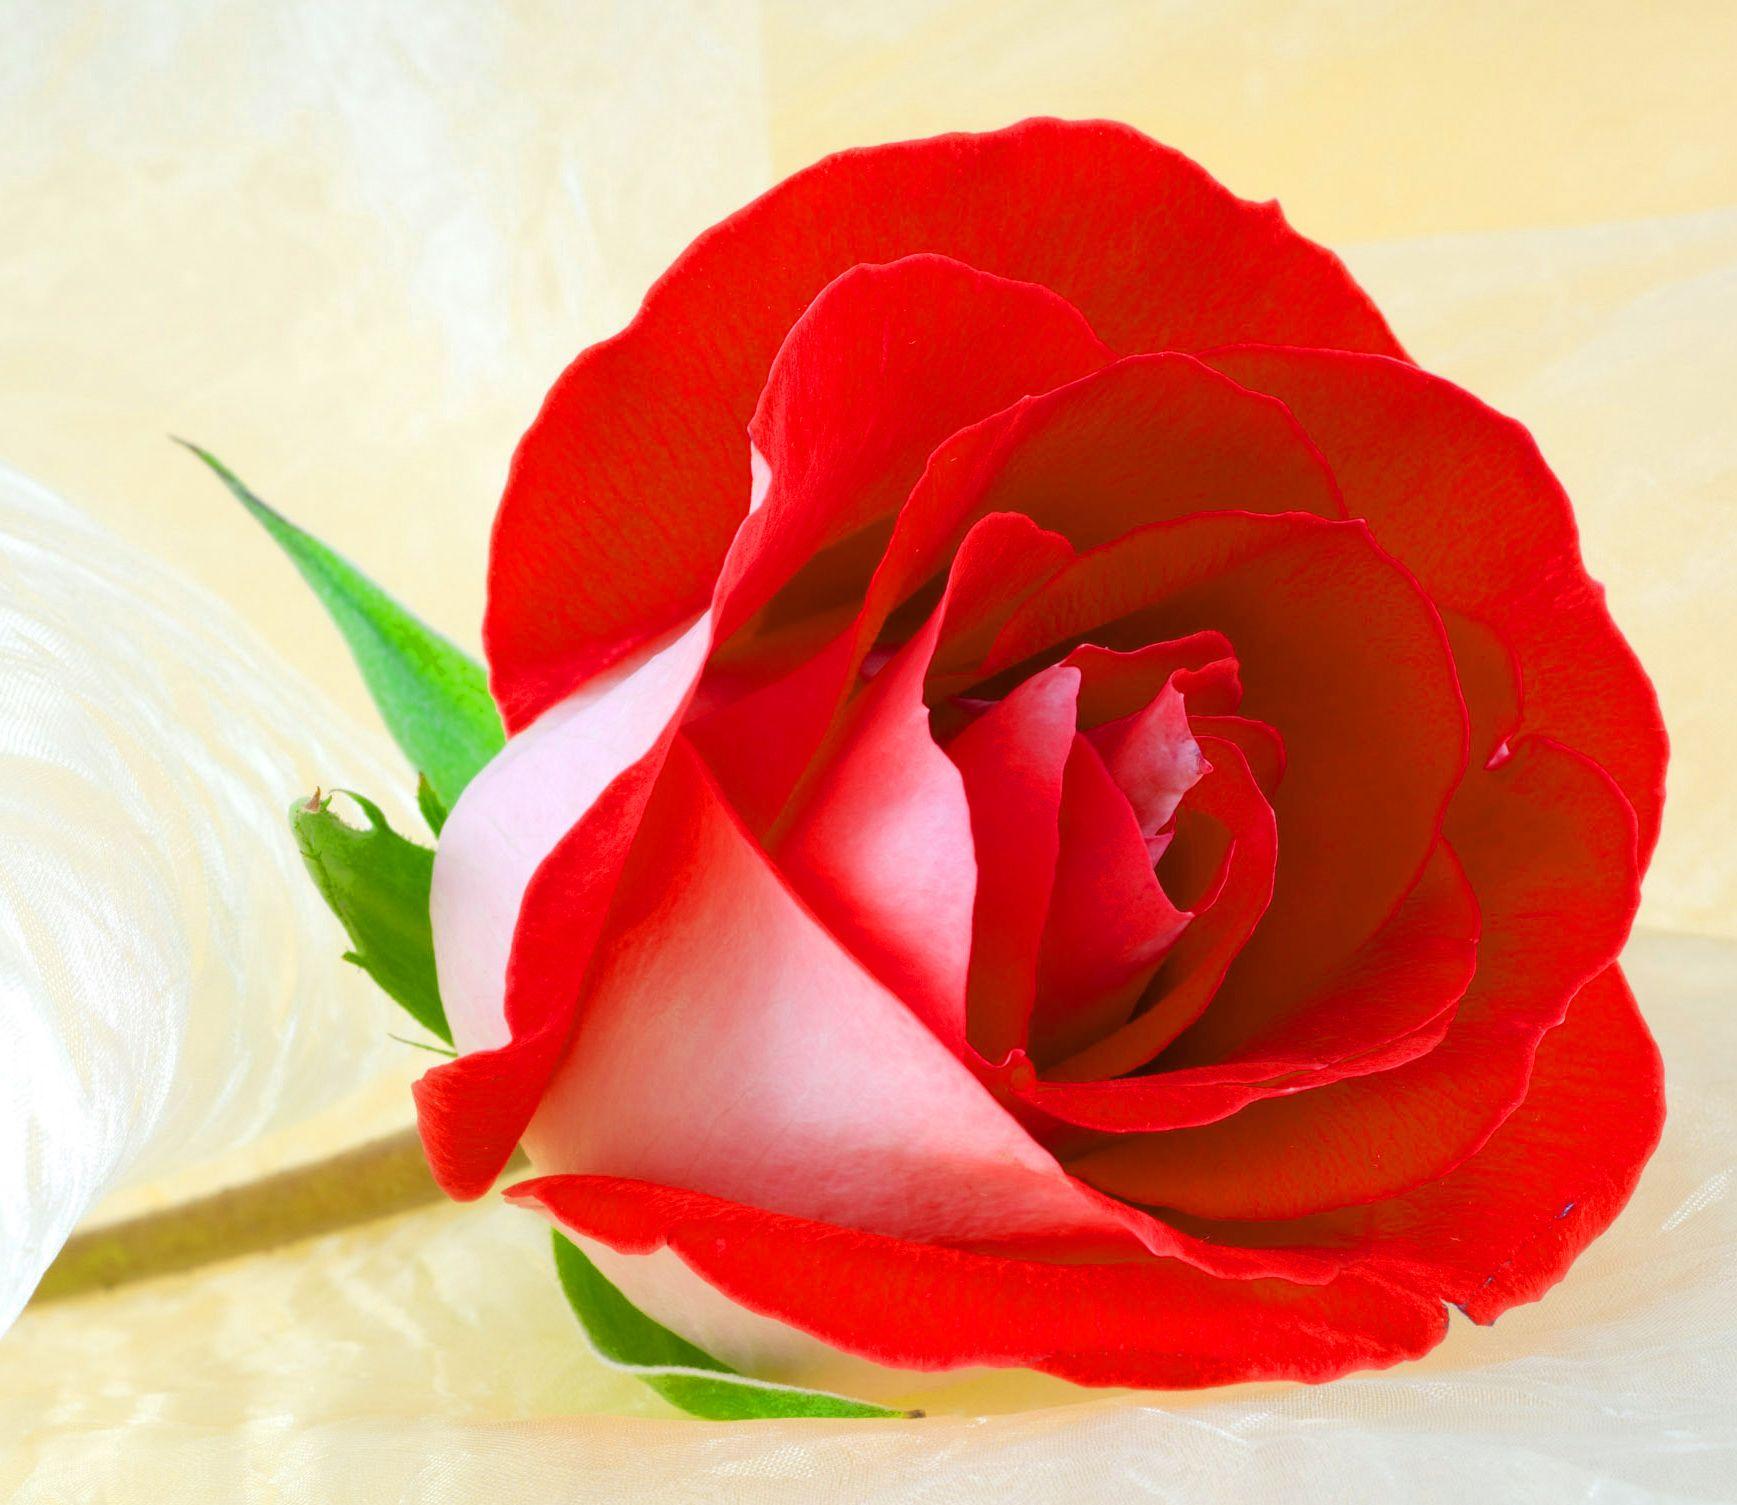 Flower Nice Whatsapp Dp Pics Hd Download Rose Flower Wallpaper Flowers Dp Beautiful Flowers Images Hd